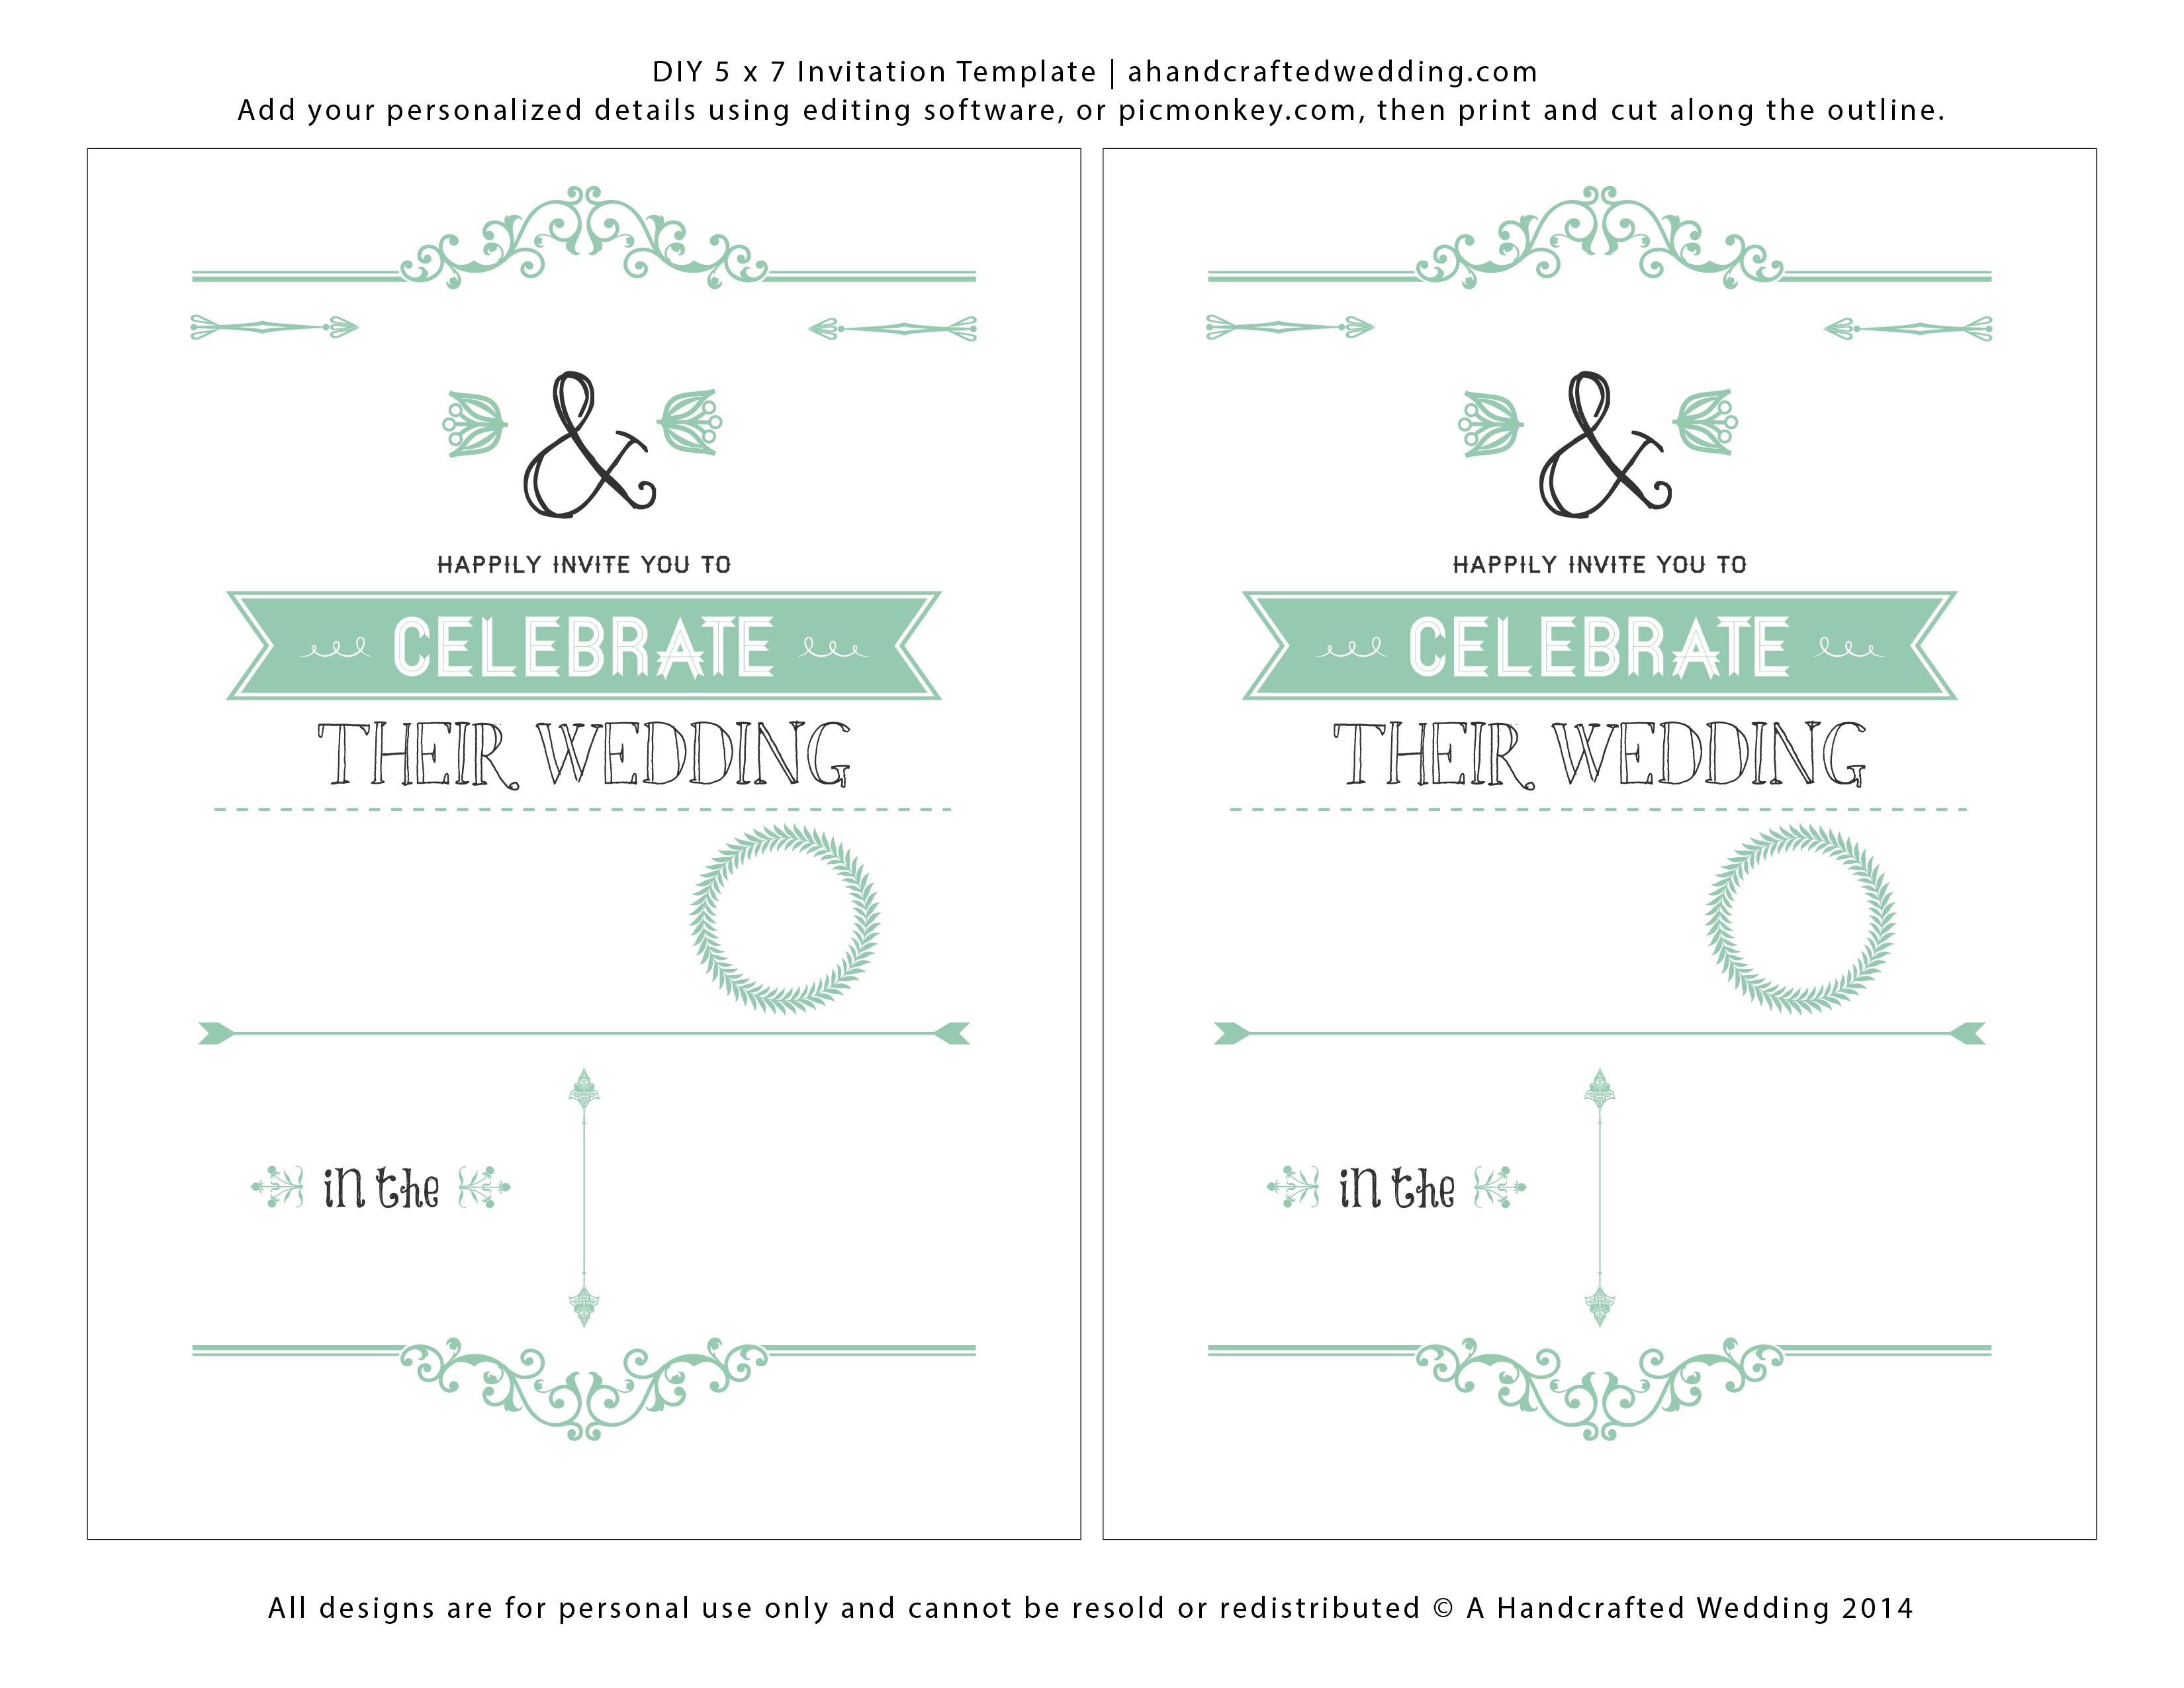 Wedding Invitation Templates Free Download   Marina Gallery Fine Art - Printable Invitation Templates Free Download